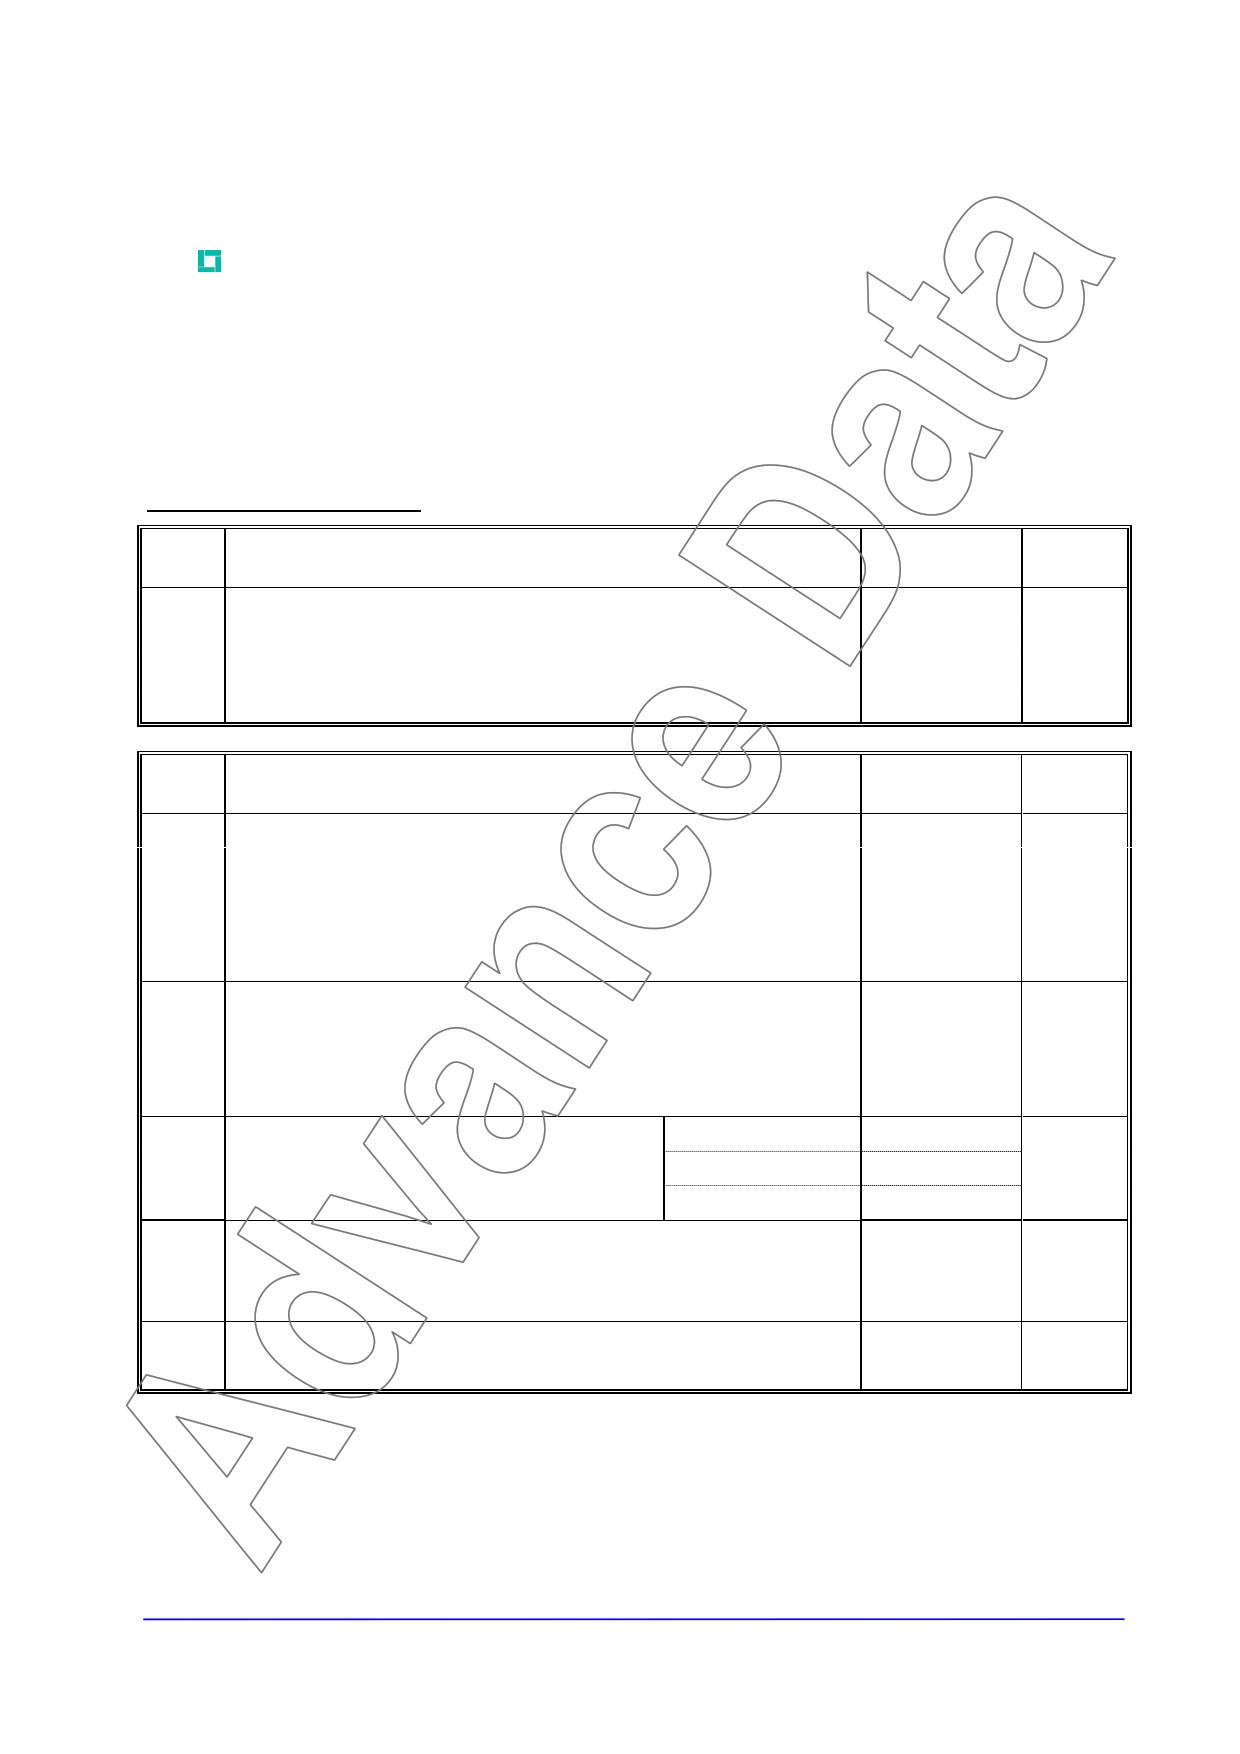 K0620QA620 datasheet